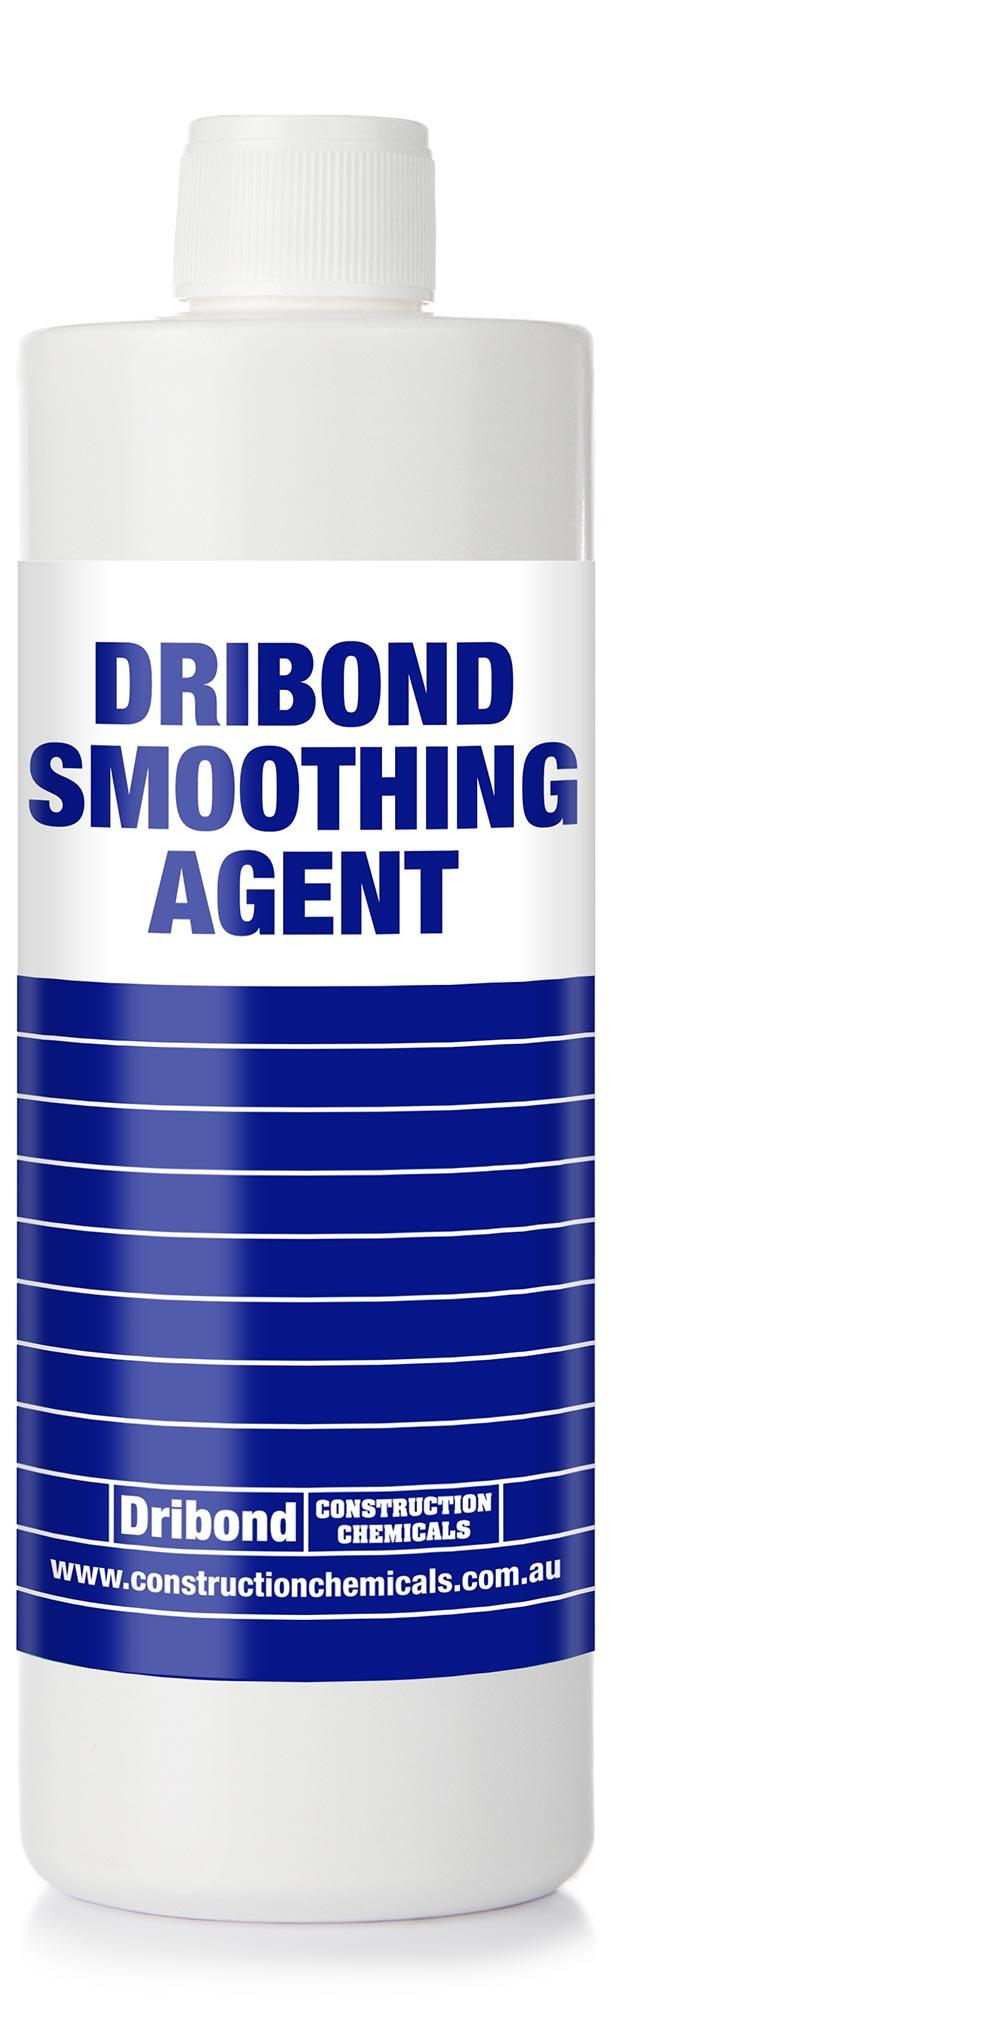 Dribond Smoothing Agent